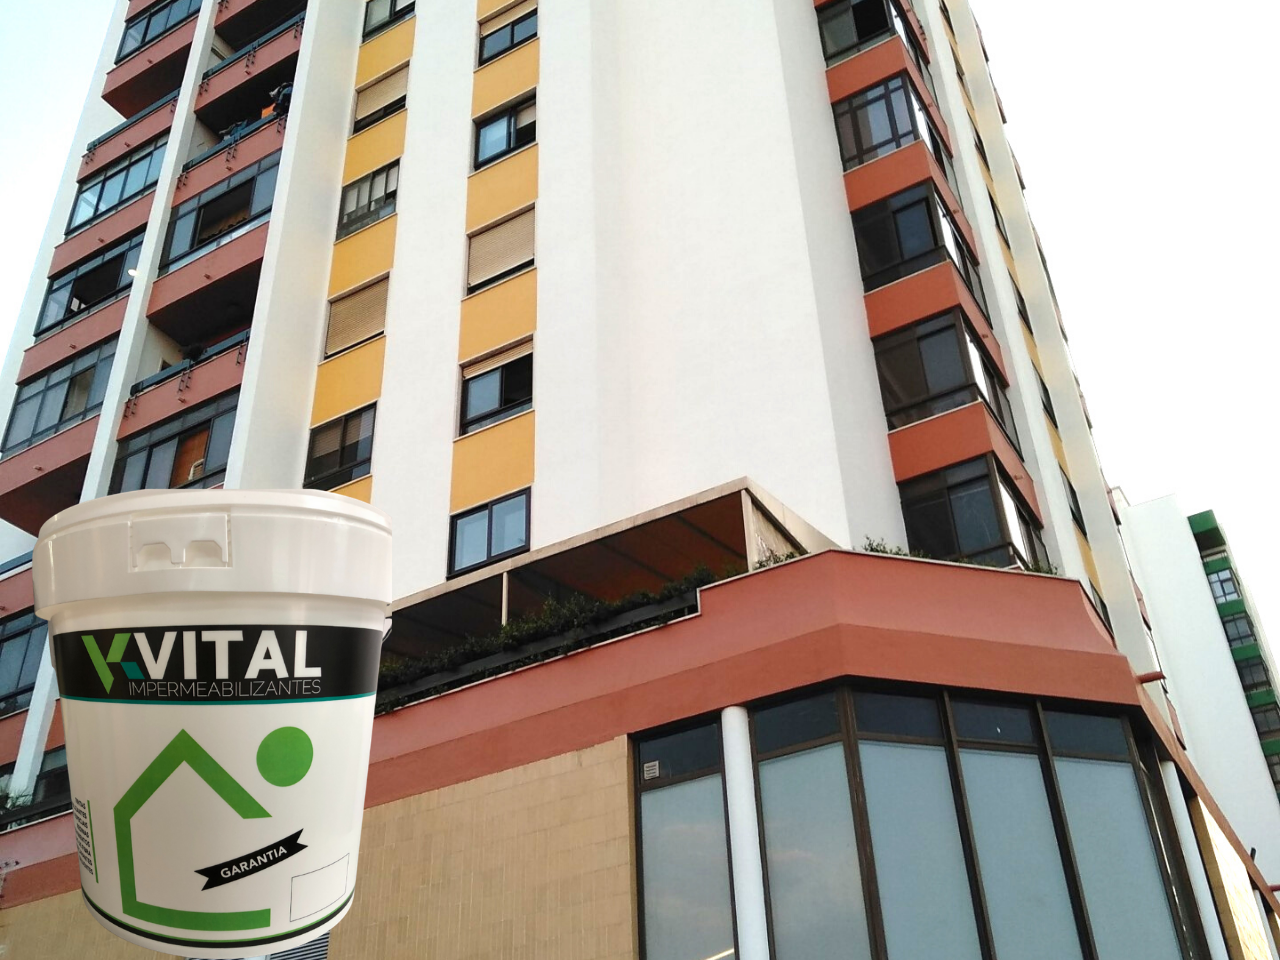 Membrax - Revestimento elástico de fachadas Acrilica 100%